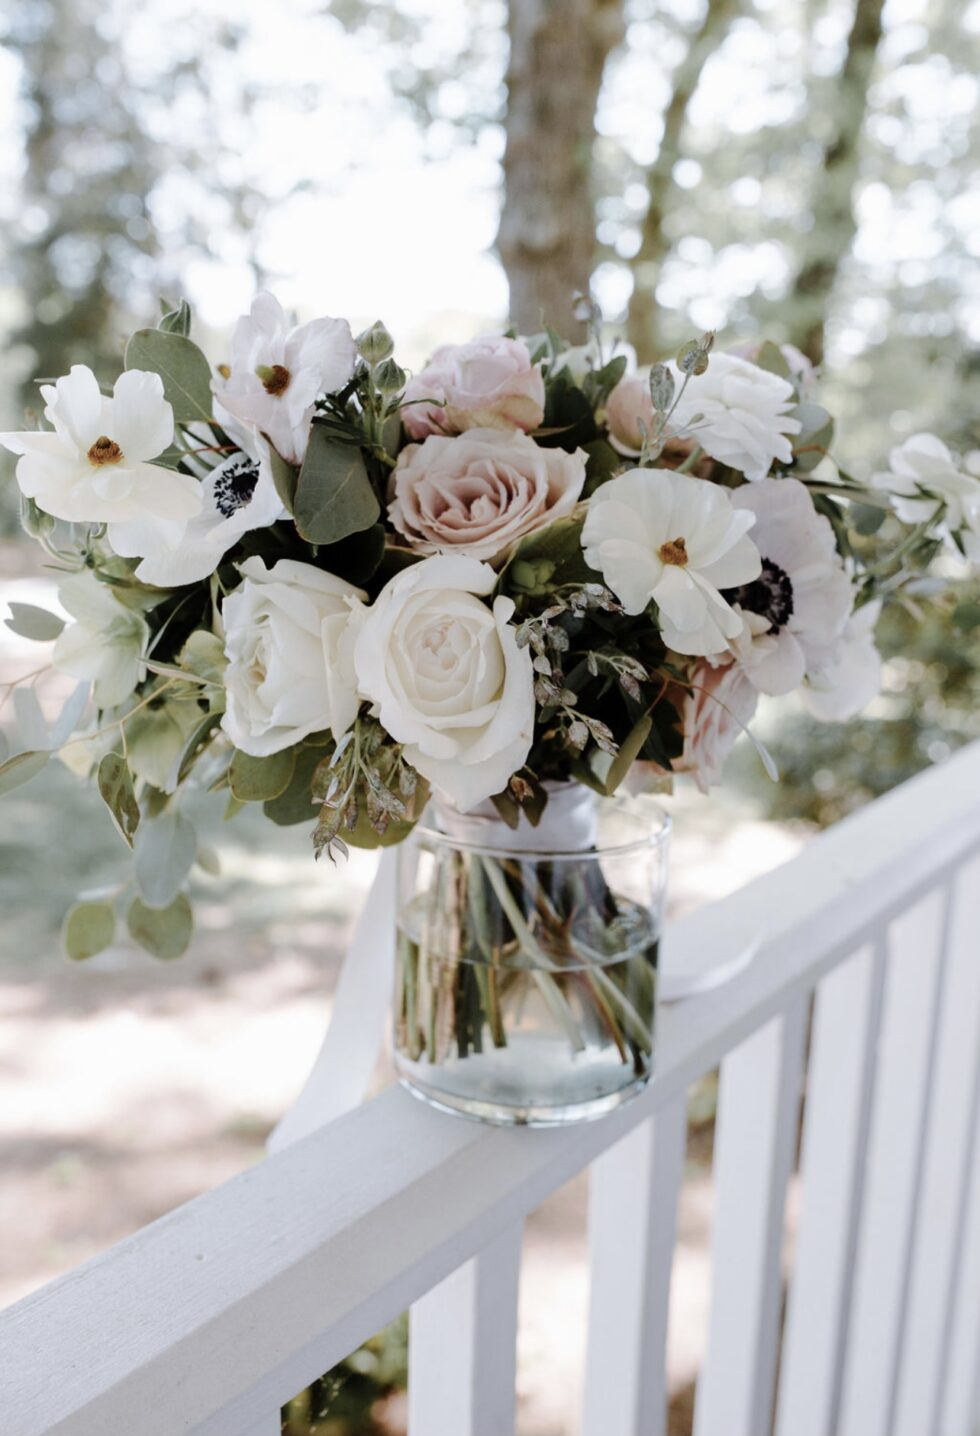 Spring-Wedding-at-Summerfield-Farms-Rachel-and-Brian-59